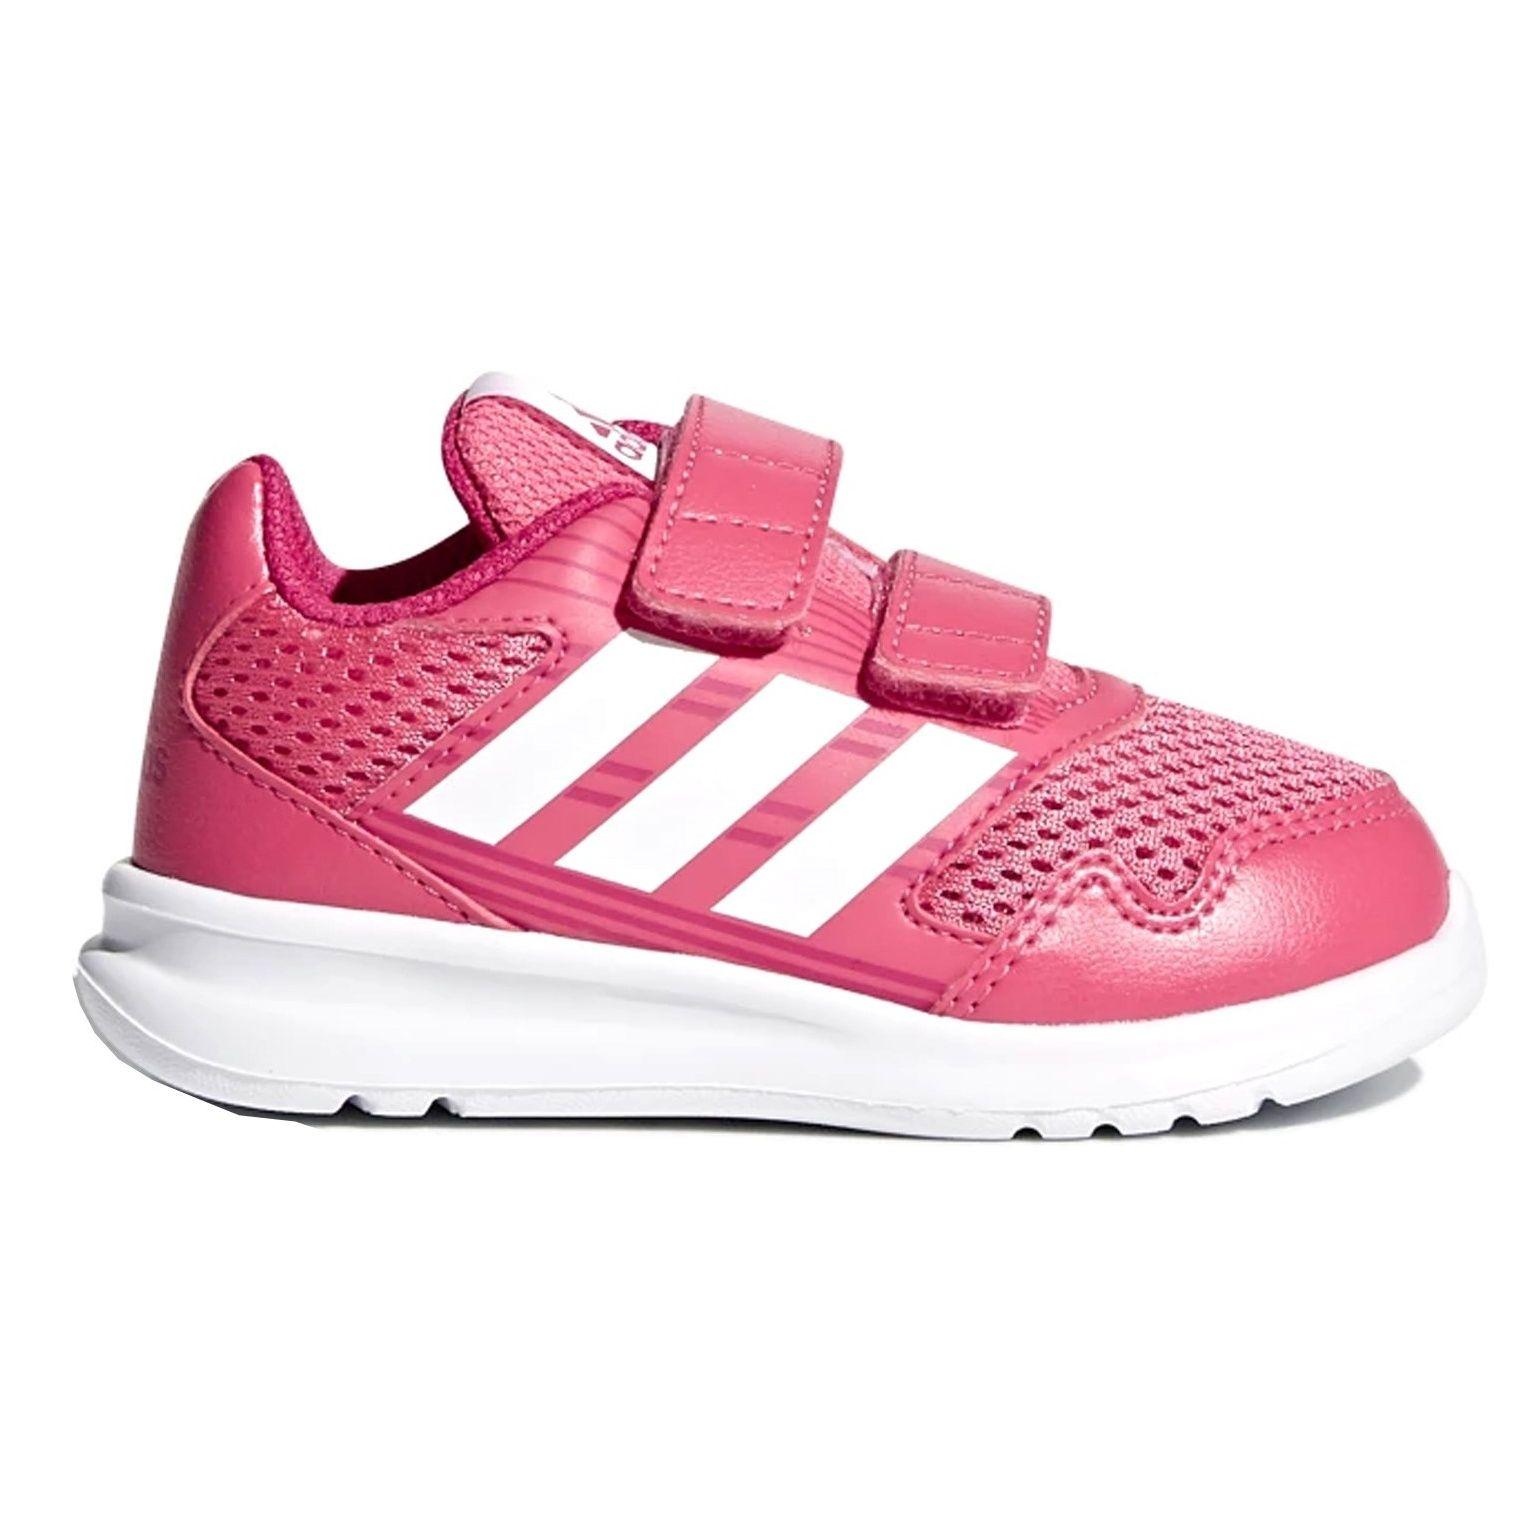 کفش دویدن چسبی نوزادی Altarun - آدیداس - صورتی - 1